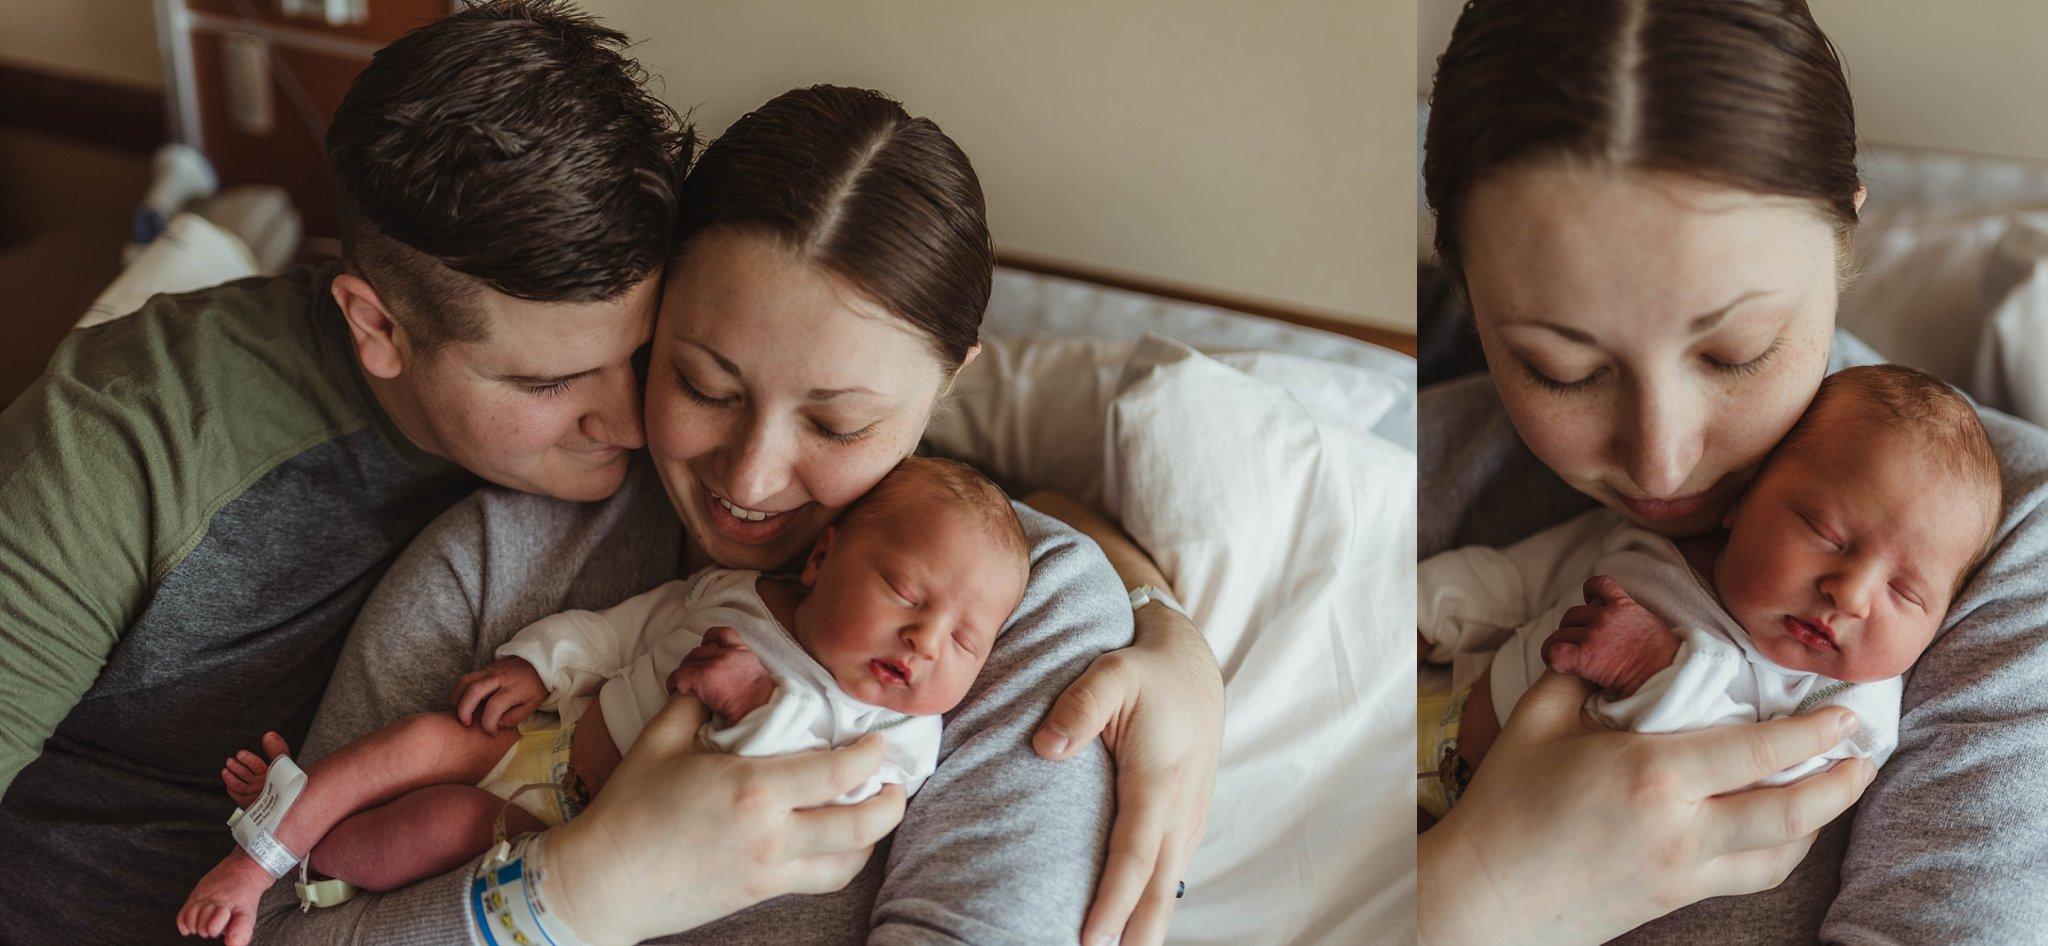 BrittneyHogue-BirthPhotographer-NewbornPhotographer-Fresh48Photographer-PeoriaIL-PekinIL-GalesburgIL-BloomingtonIL (4).jpg